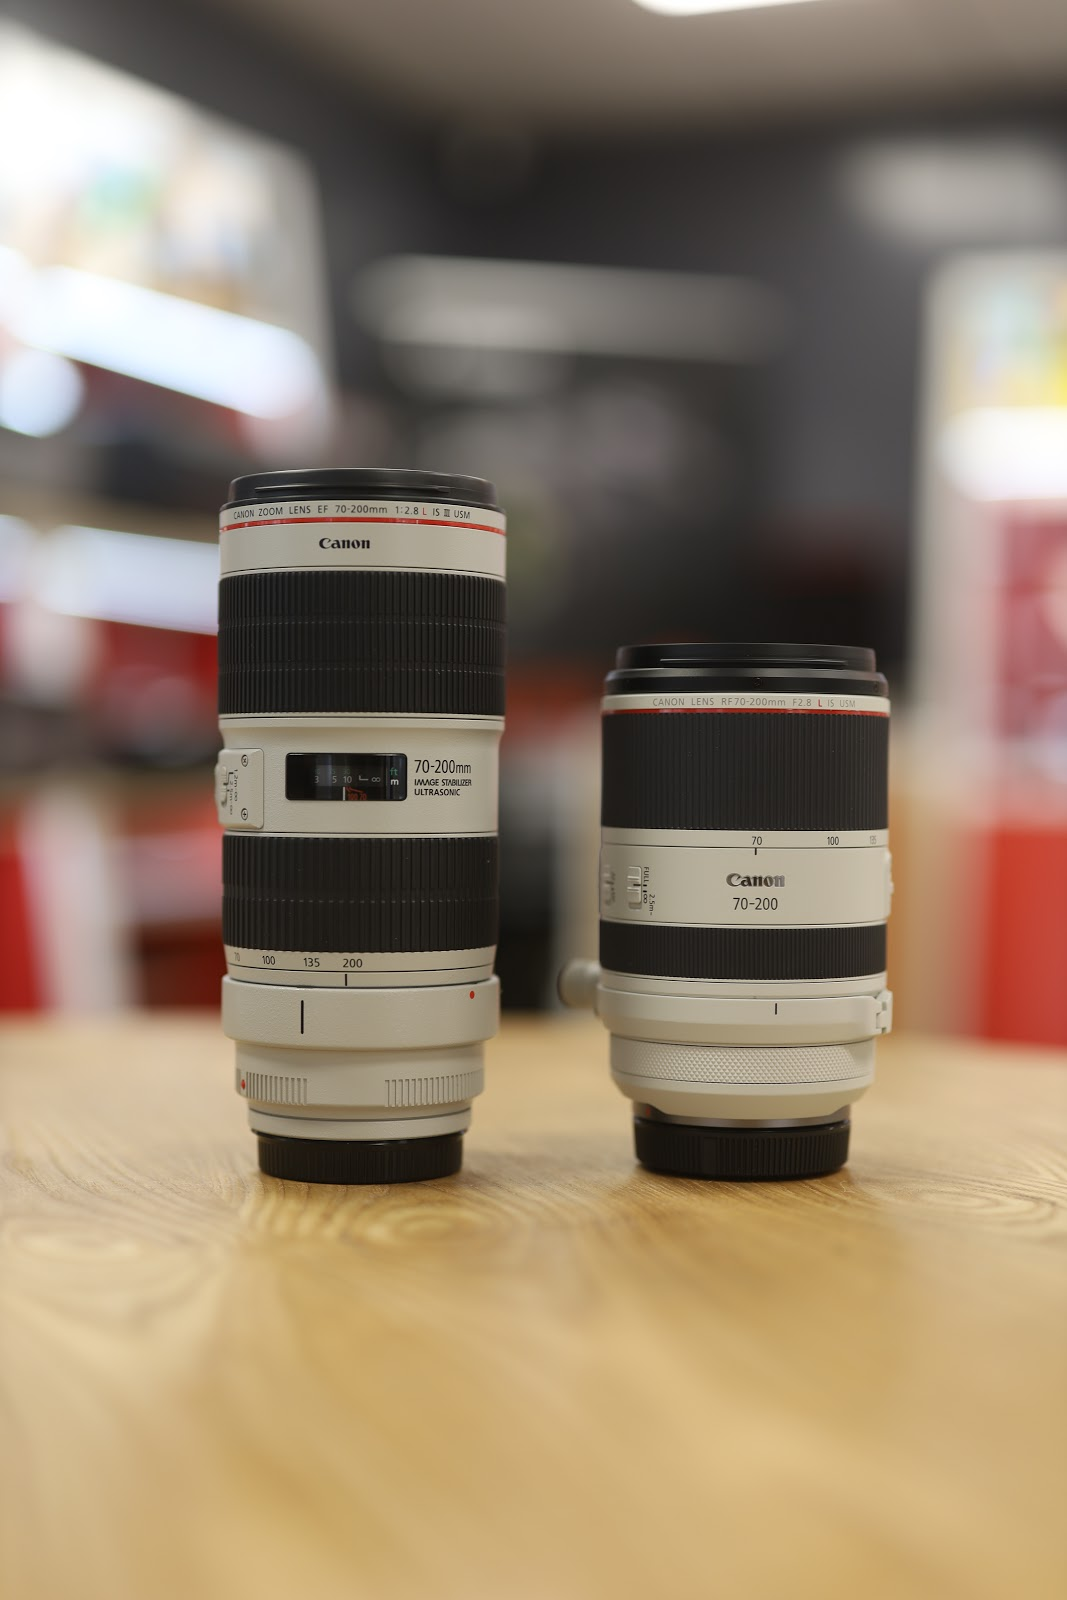 New Canon RF 70-200